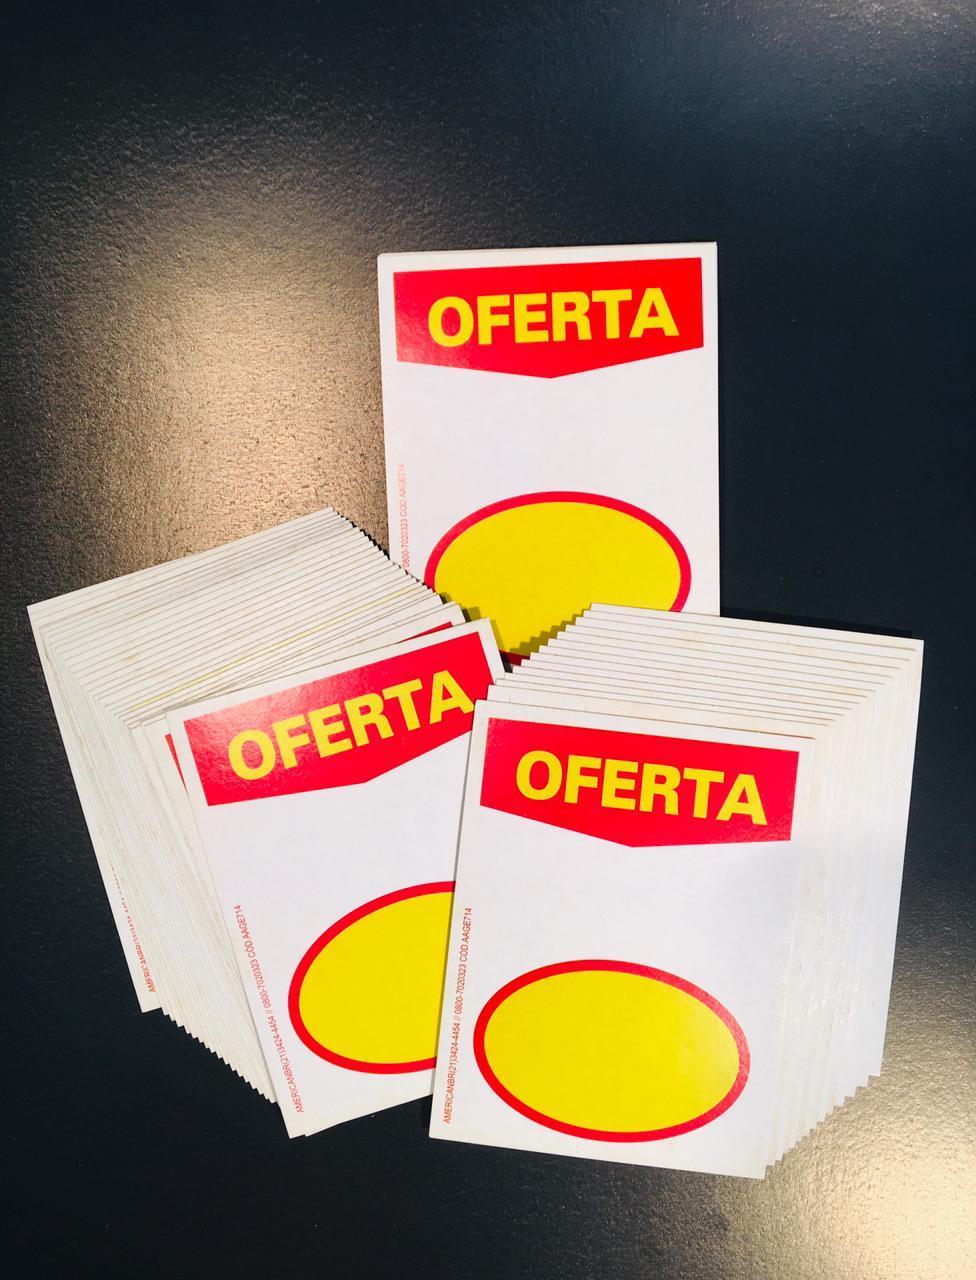 CARTAZ OFERTA COM ELIPSE 7,5X10 (C/ 50 UNIDADES)